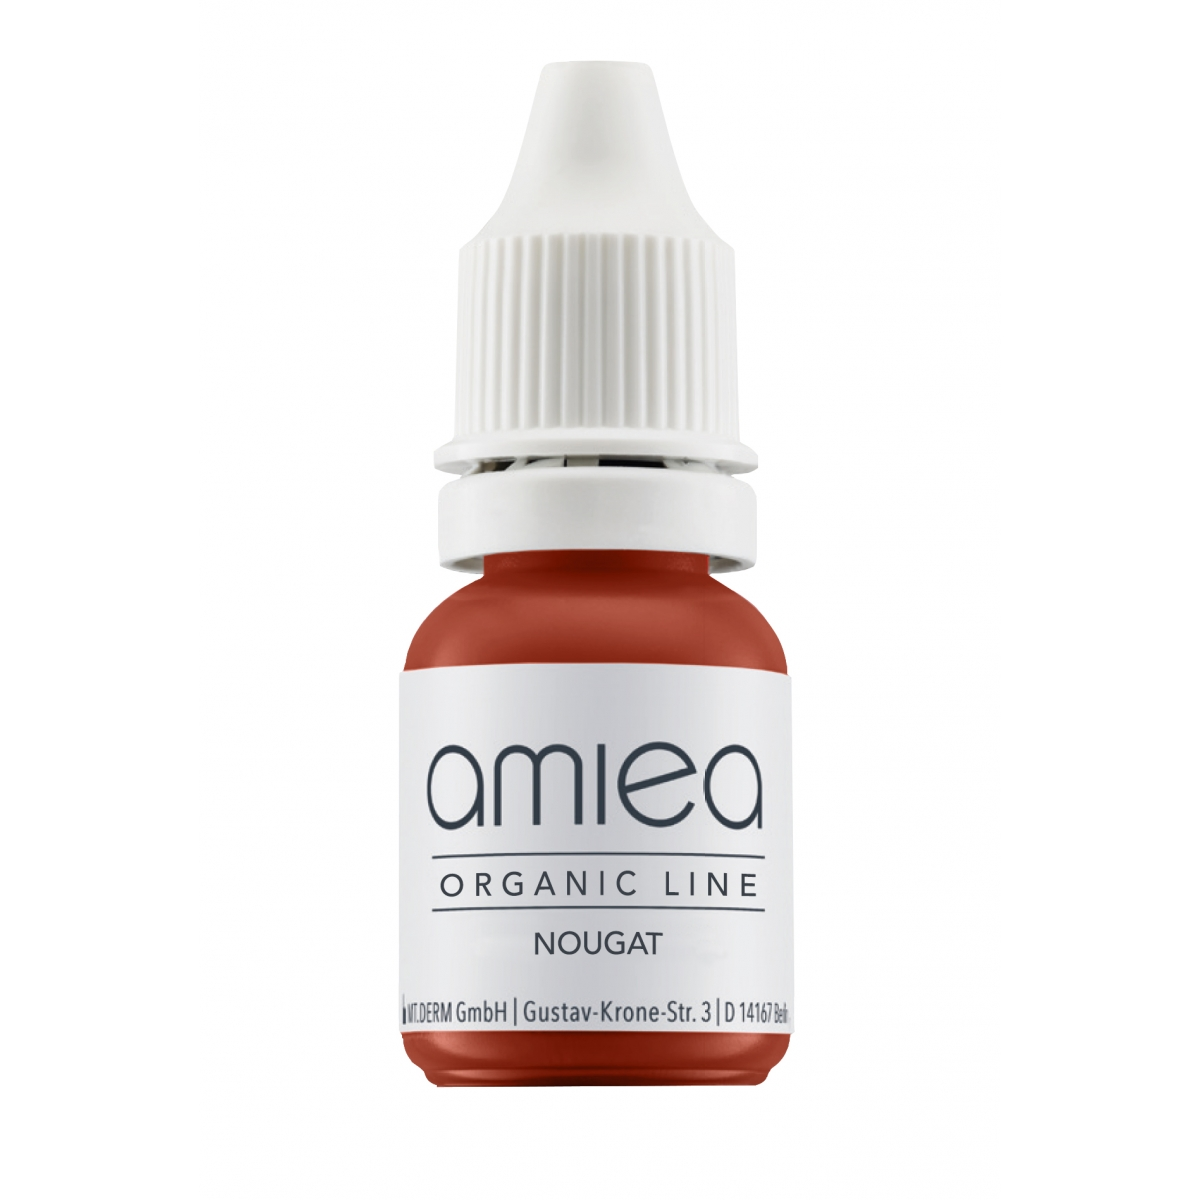 ORGANIC LINE (10ml) - PIGMENT NOUGAT ORGANICLINE AMIEA (10 ml)